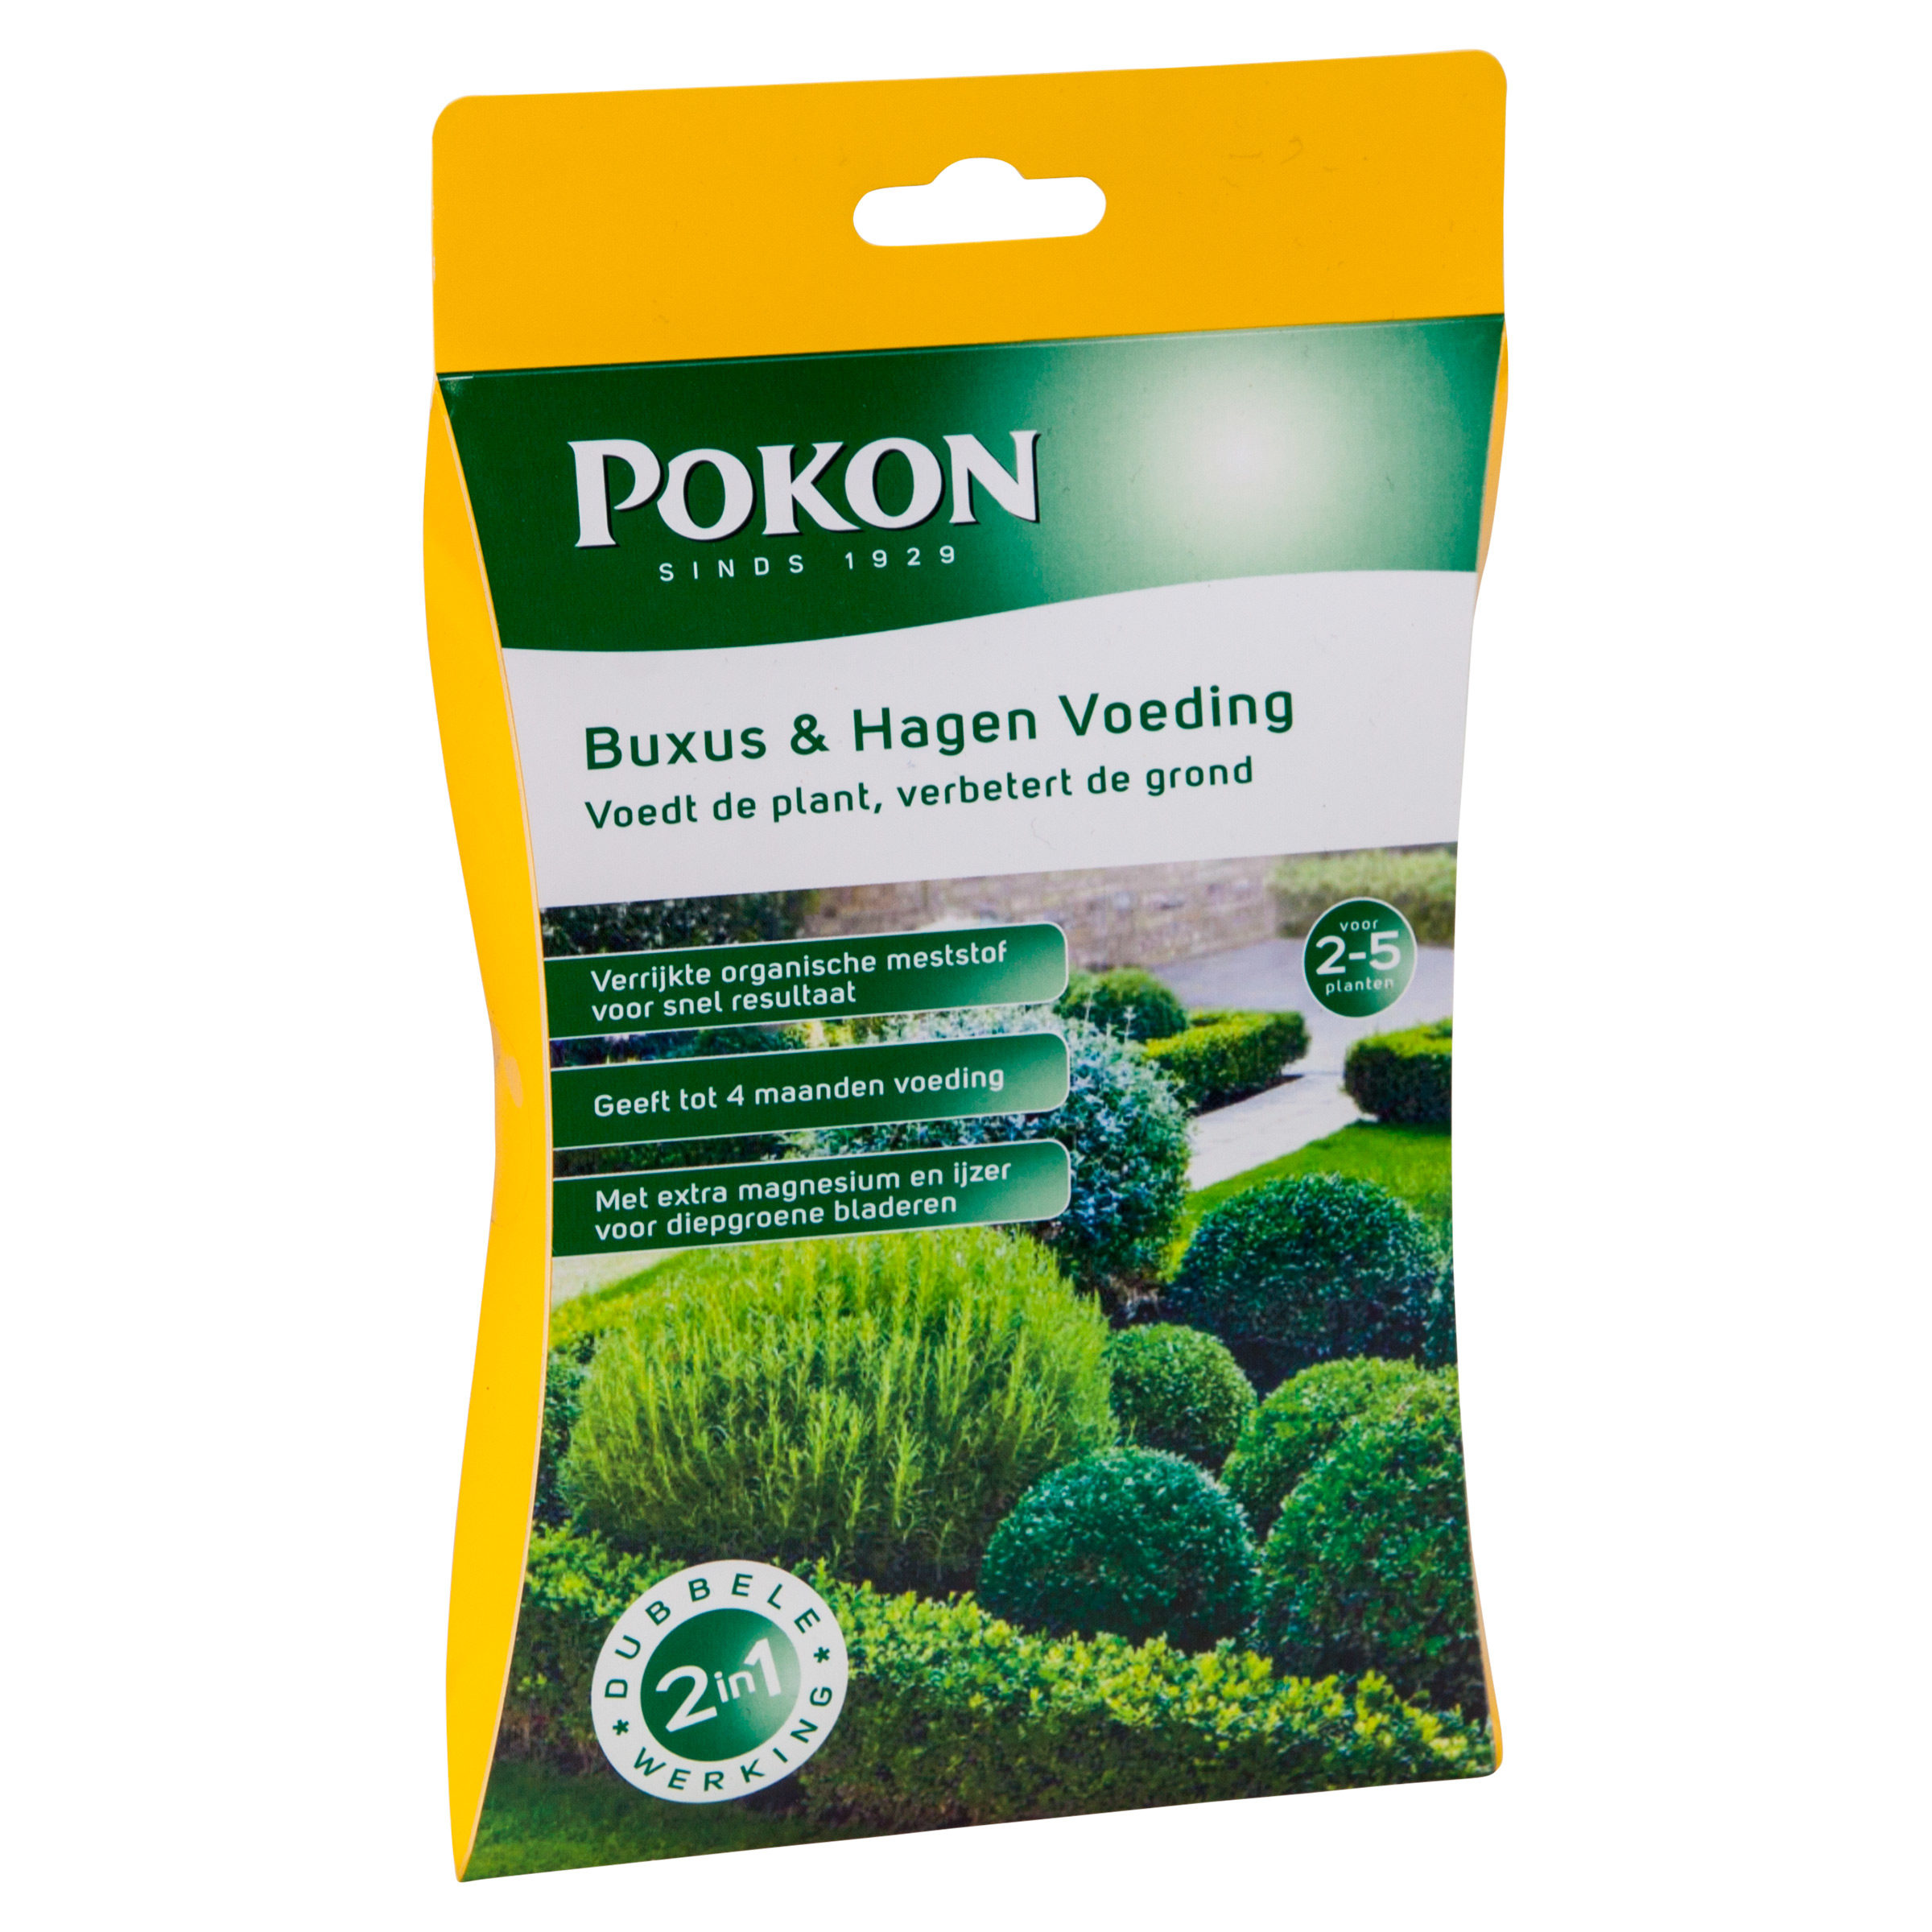 Pokon Buxus Voeding 100gr